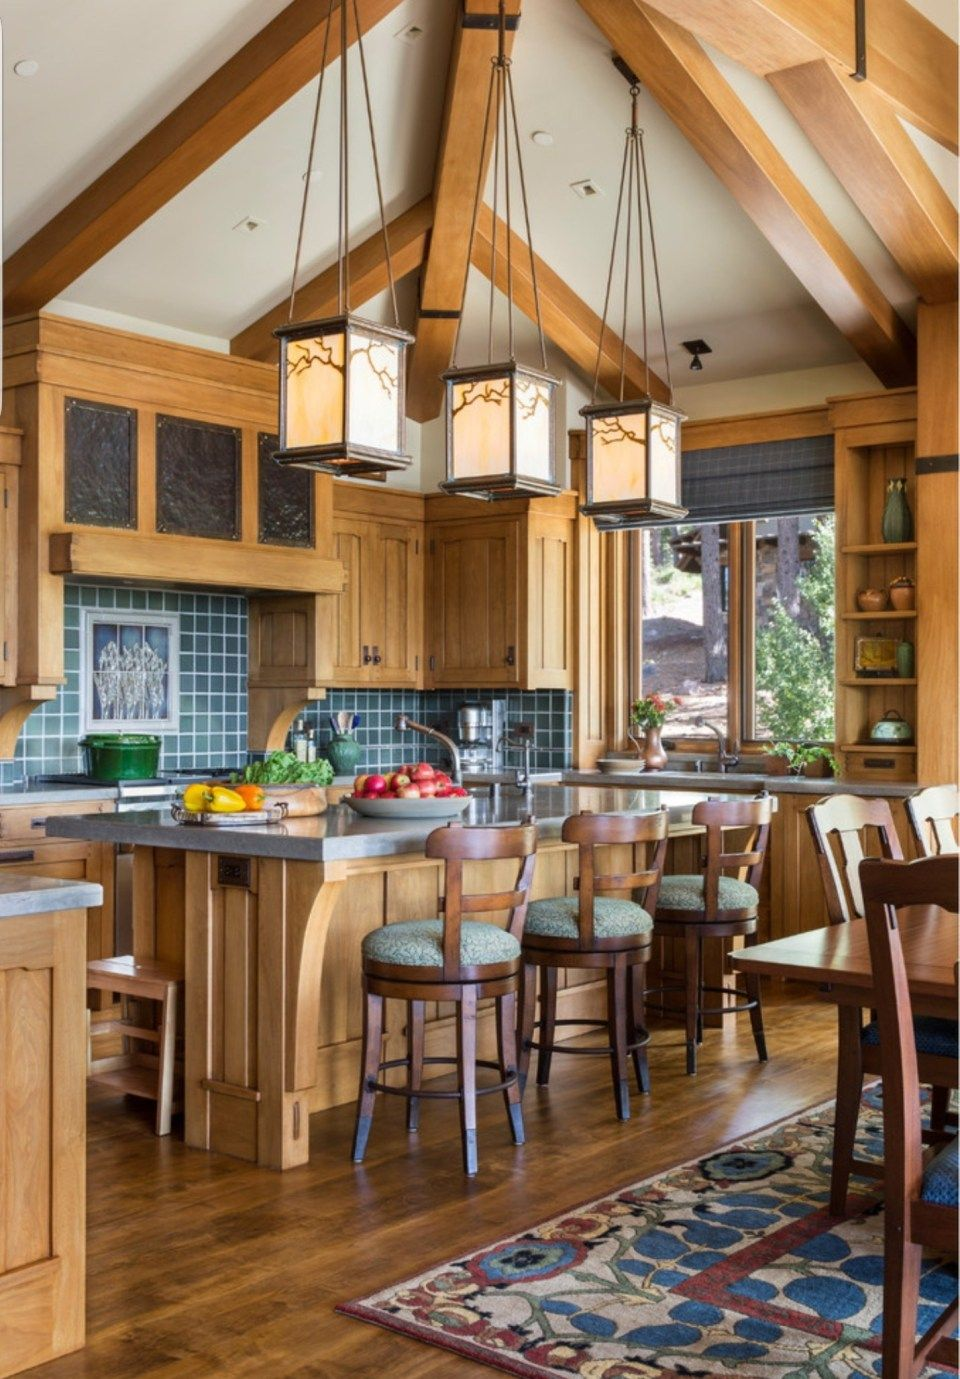 small u shaped kitchen ideas pro cons tips on designing u shaped kitchen small u shaped on kitchen ideas u shaped id=61936